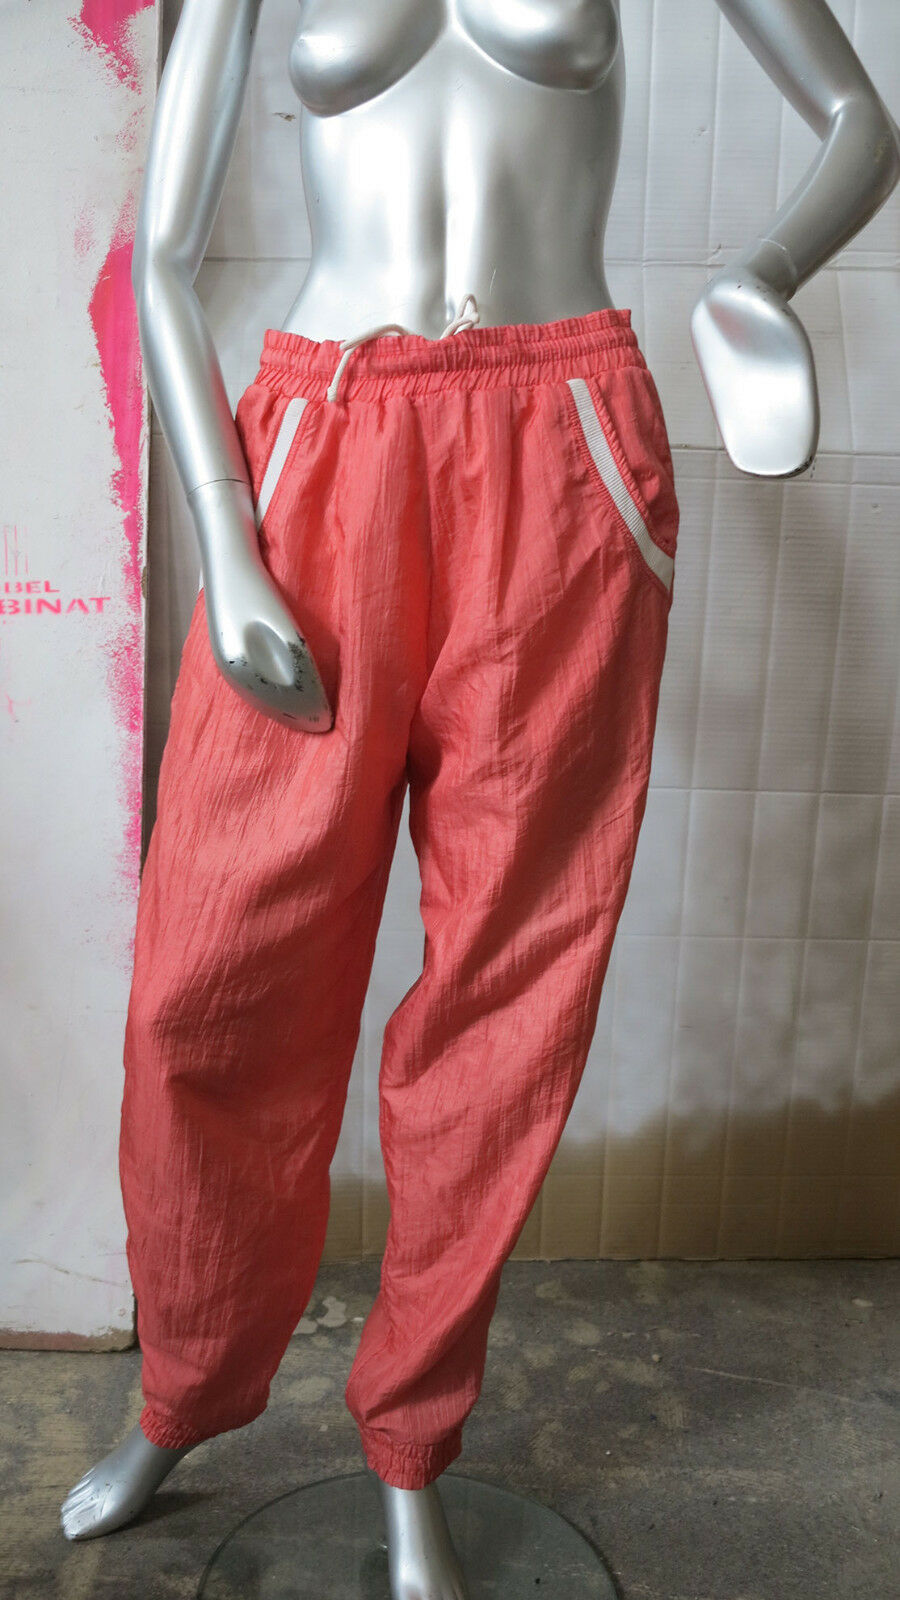 Dunlop fashion señora pantalones de entrenamiento pantalones deportivos 80s True vintage fitness trousers